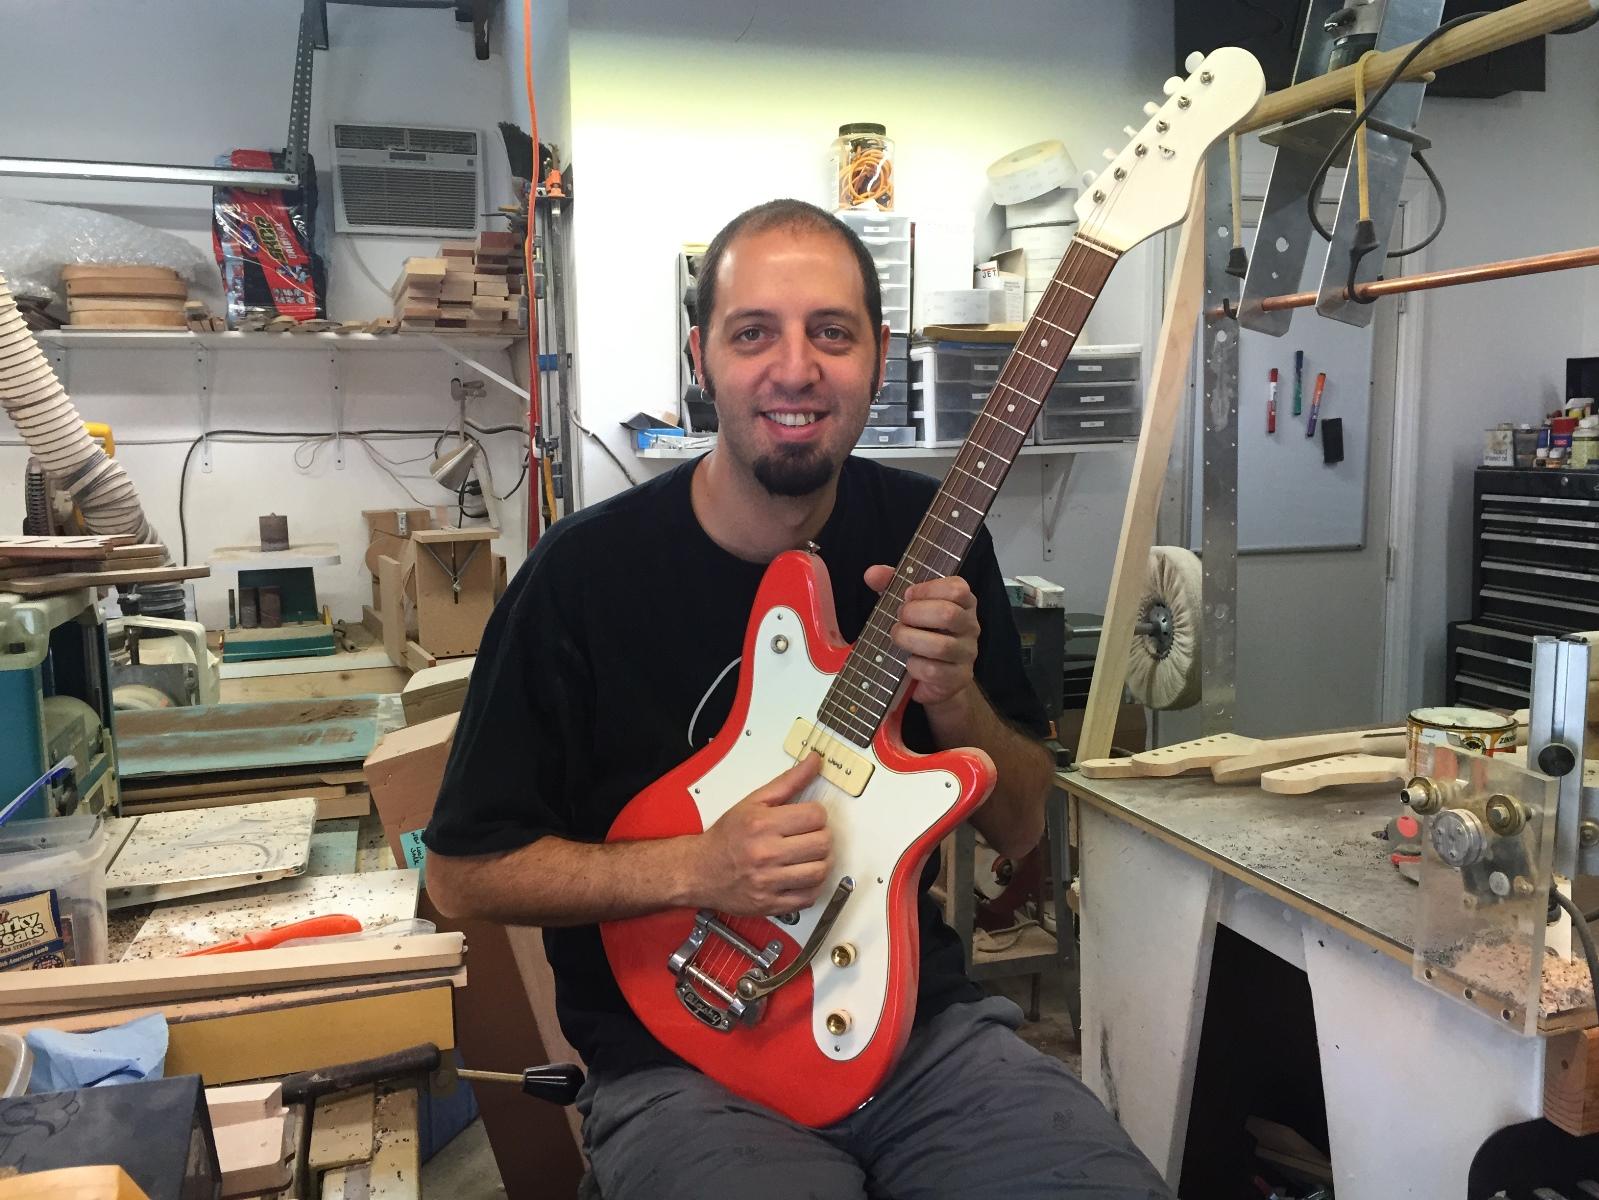 Avishay Shabat at work in his studio. Photo by Stacey Shabat